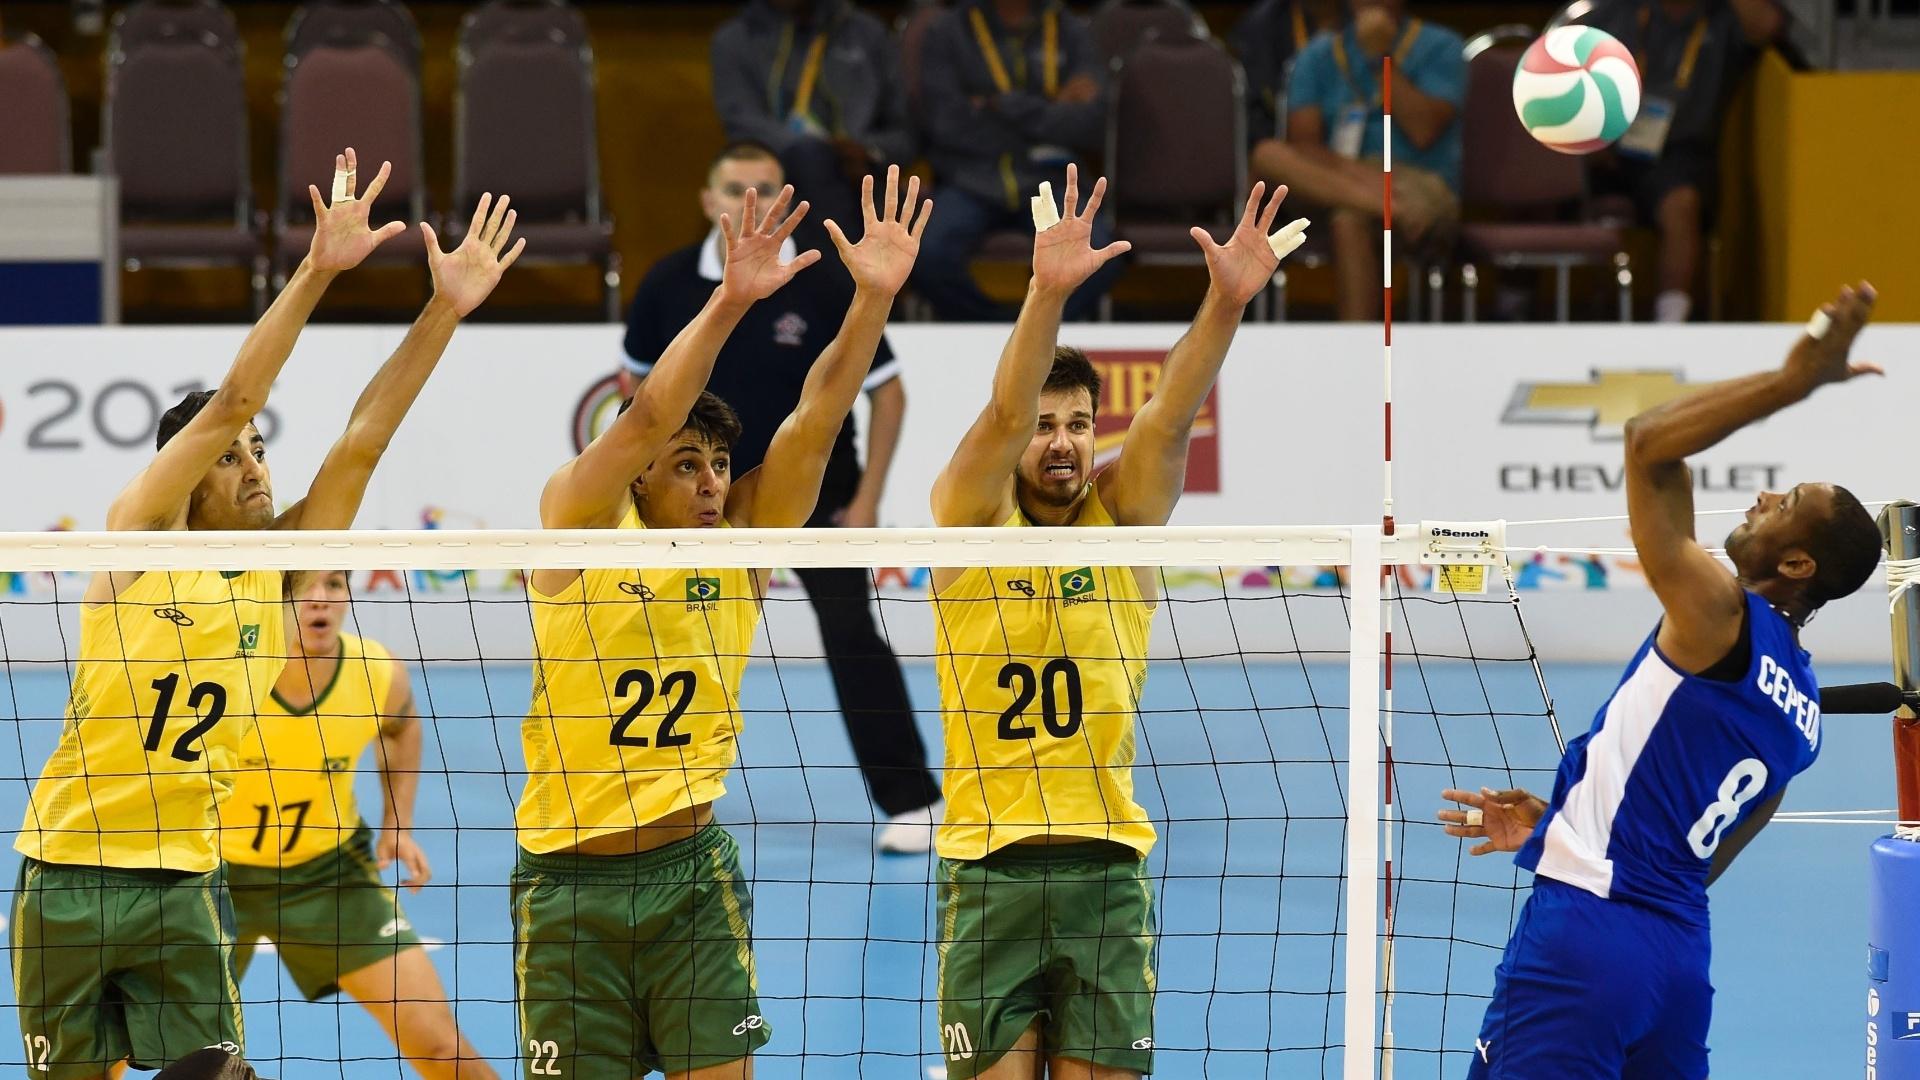 Brasil enfrenta Cuba pelo vôlei masculino do Pan